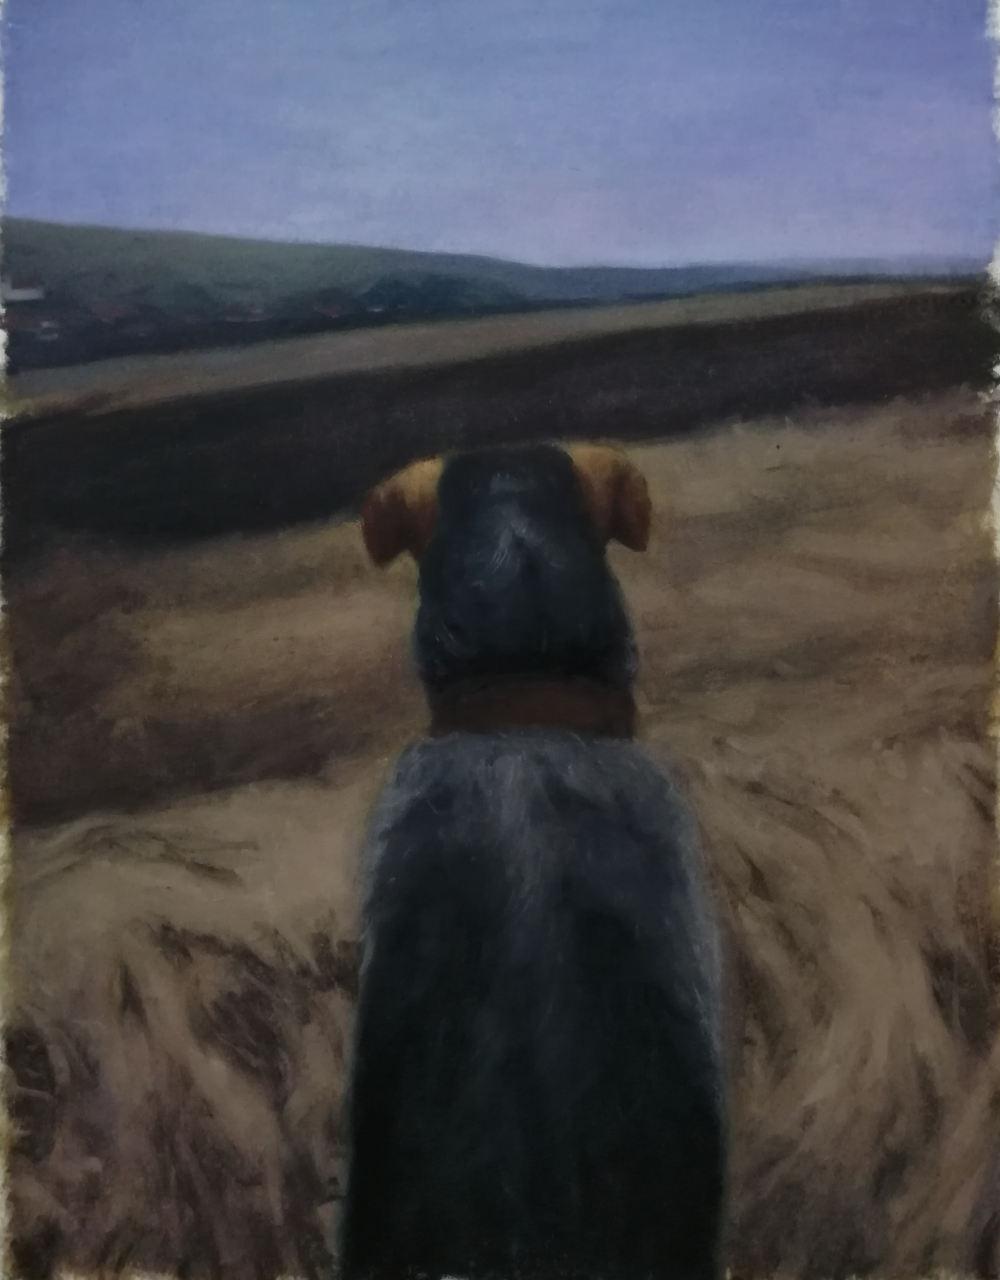 Cristian Avram, The thinking dog, 2019. Oil on canvas 69x90cm